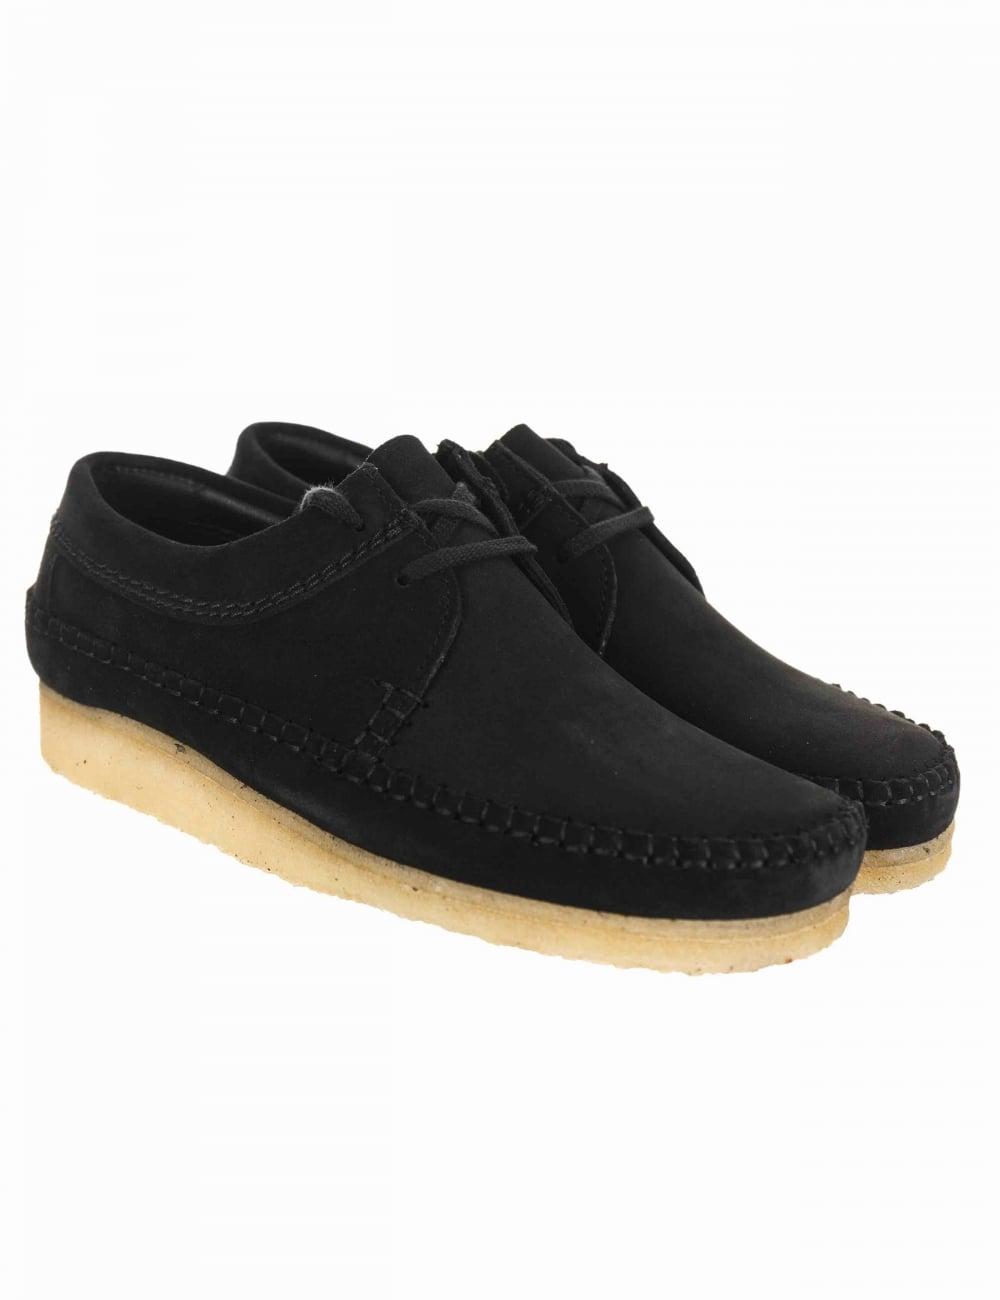 cba534cf9ff Clarks Originals Weaver Shoe - Black Suede - Footwear from Fat ...